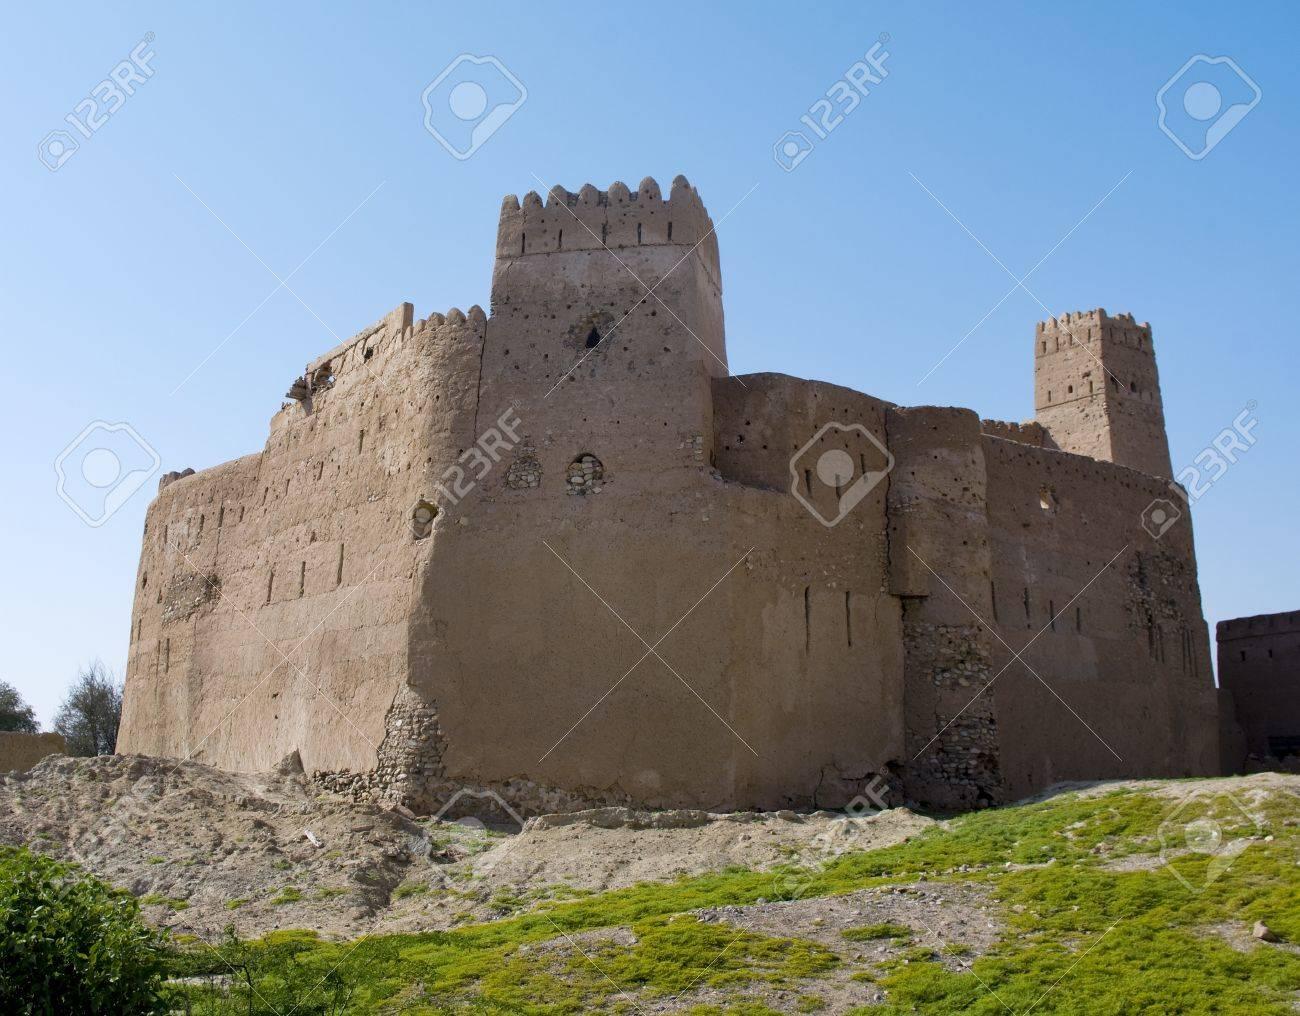 Fort Jalan Bani Bu Ali, Hammouda Al-Qala,Sultanate of Oman, Middle East Stock Photo - 16702821